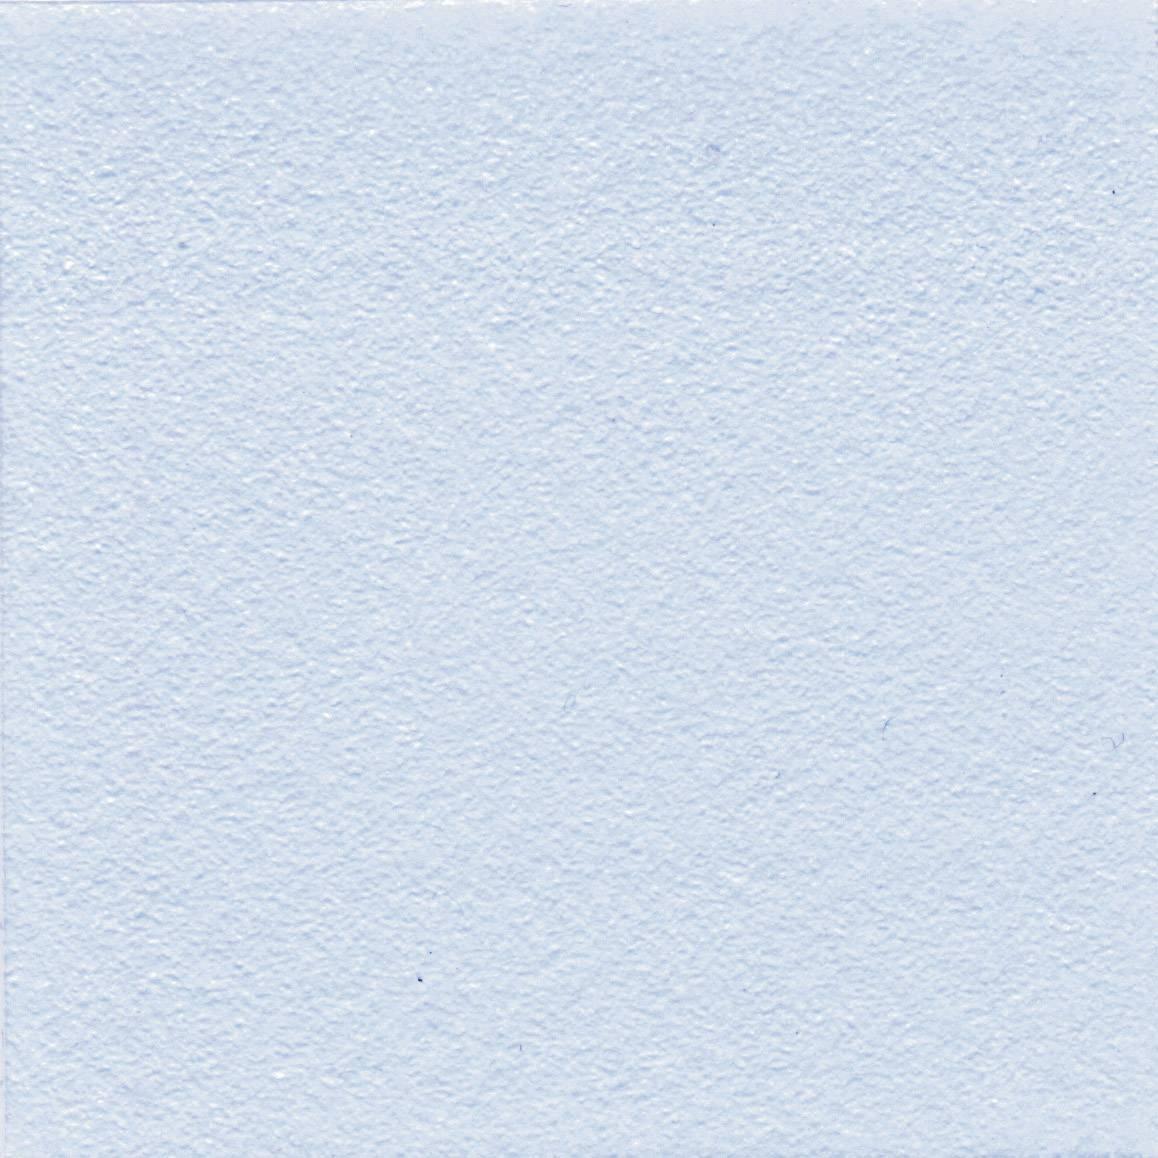 Teplovodivá fólia Kerafol SOFTTHERM 86/300, 1 mm, 3 W/mK, (d x š) 50 mm x 50 mm